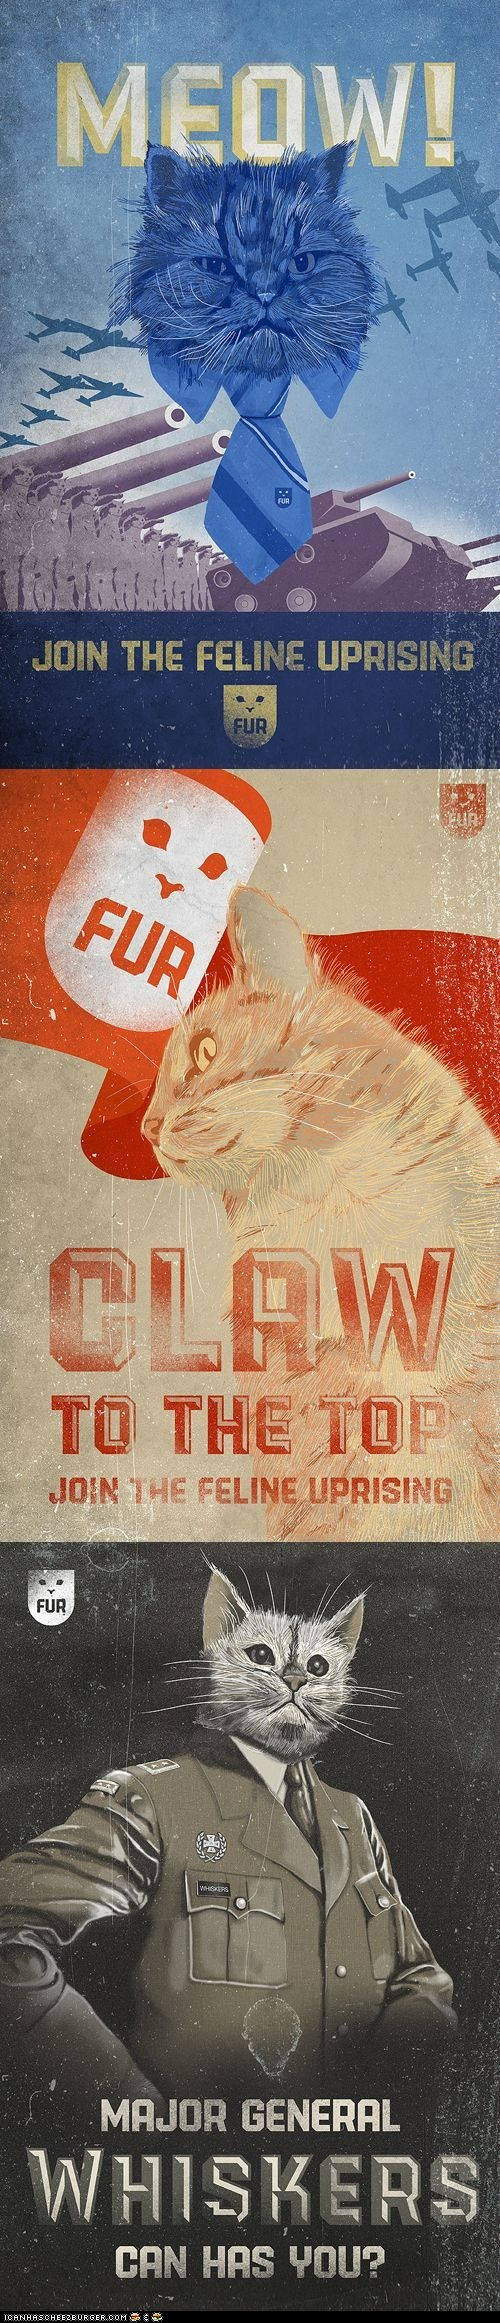 The Feline Takeover Begins